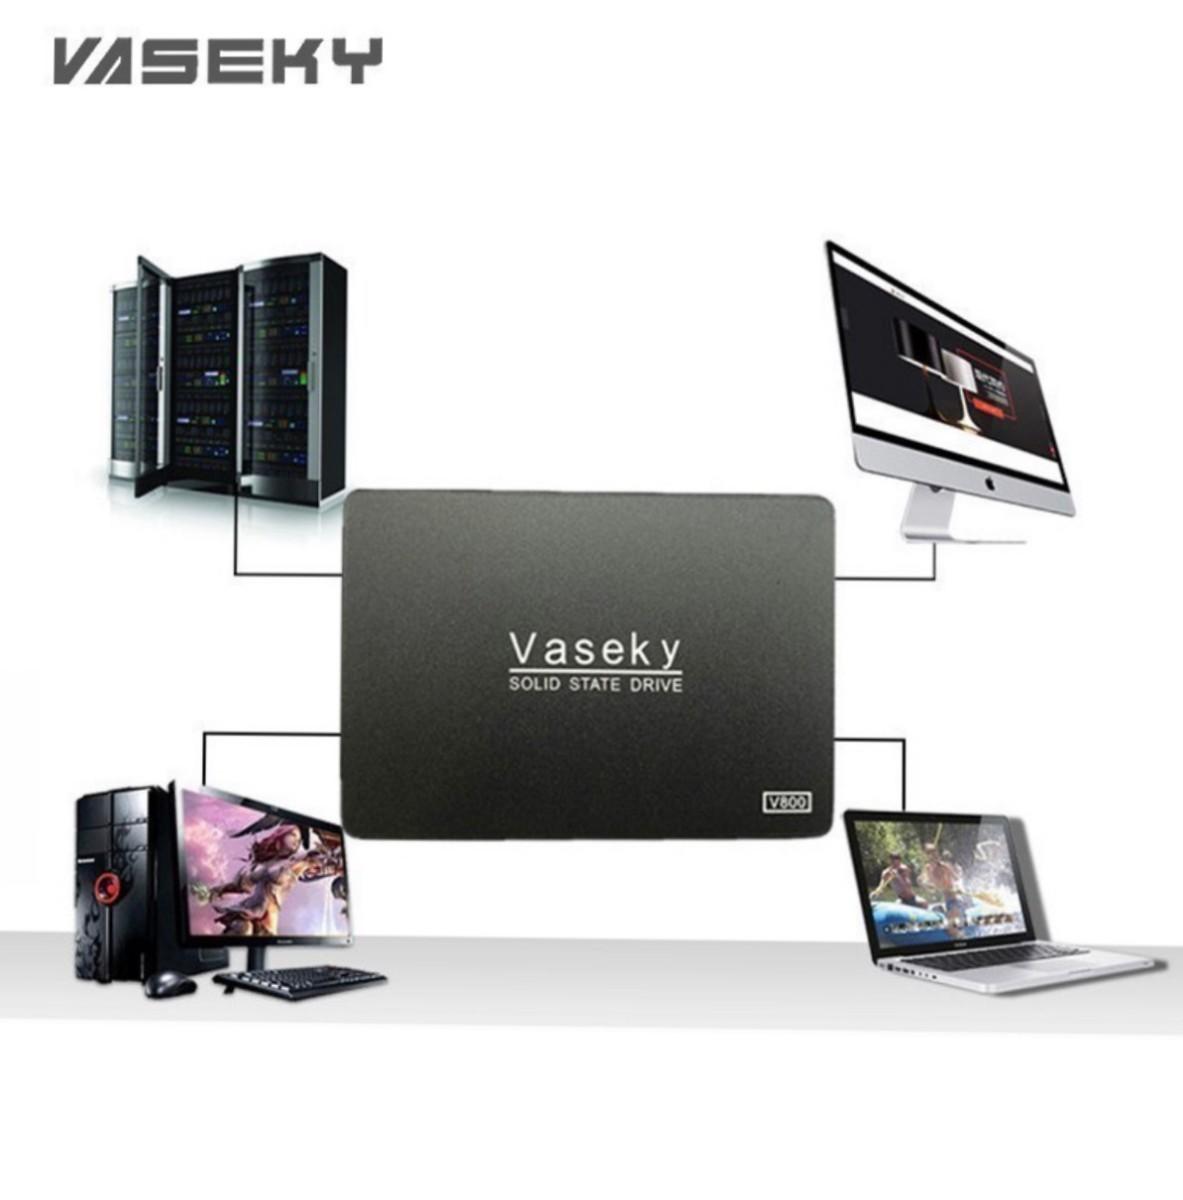 SSD 120GB Vaseky 新品 未開封2.5インチ  テレワーク推薦品(1000以上プレゼント付き)限定販売、早い者勝ち